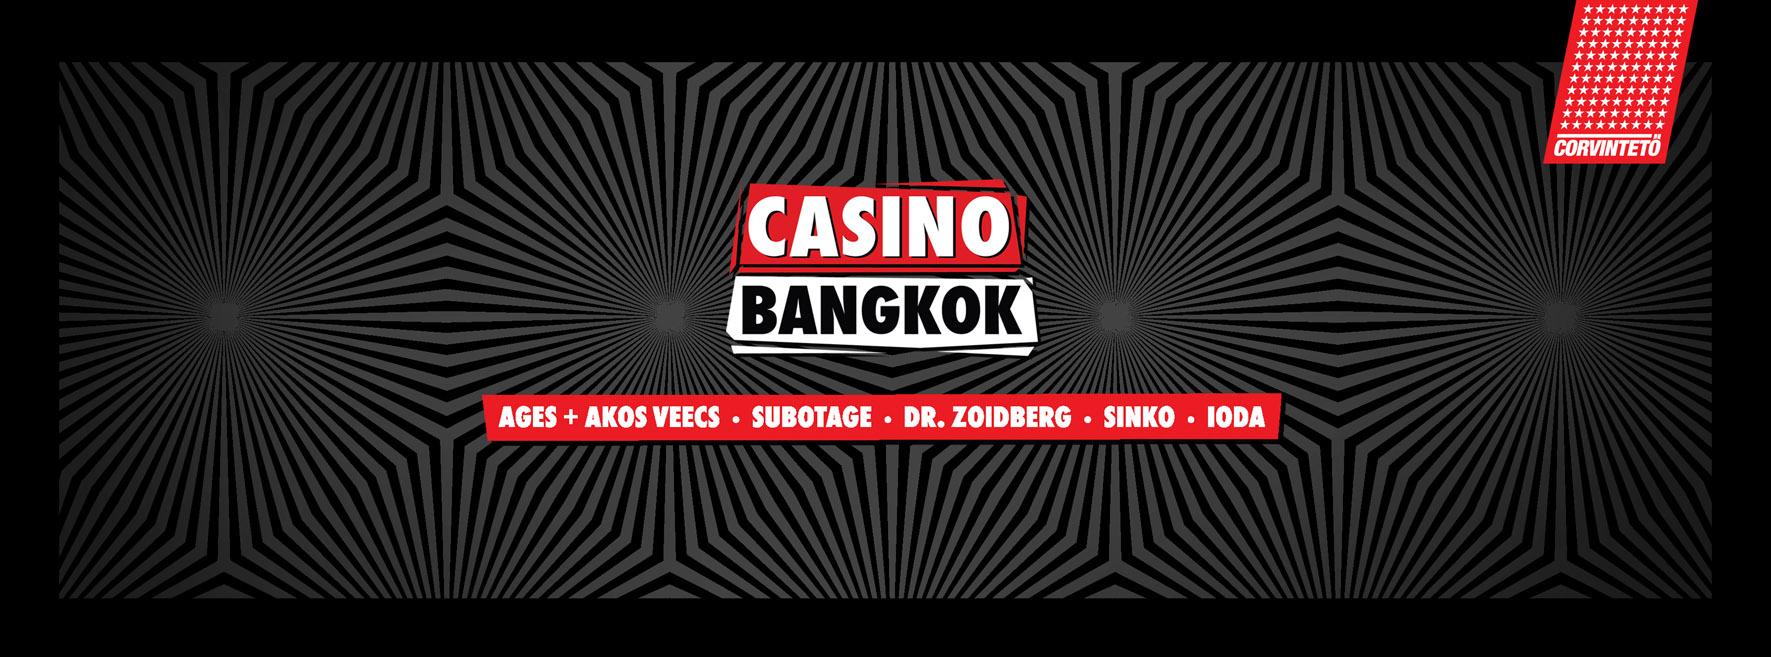 Casino cover AGES + AKOS VEECS full ver1-2